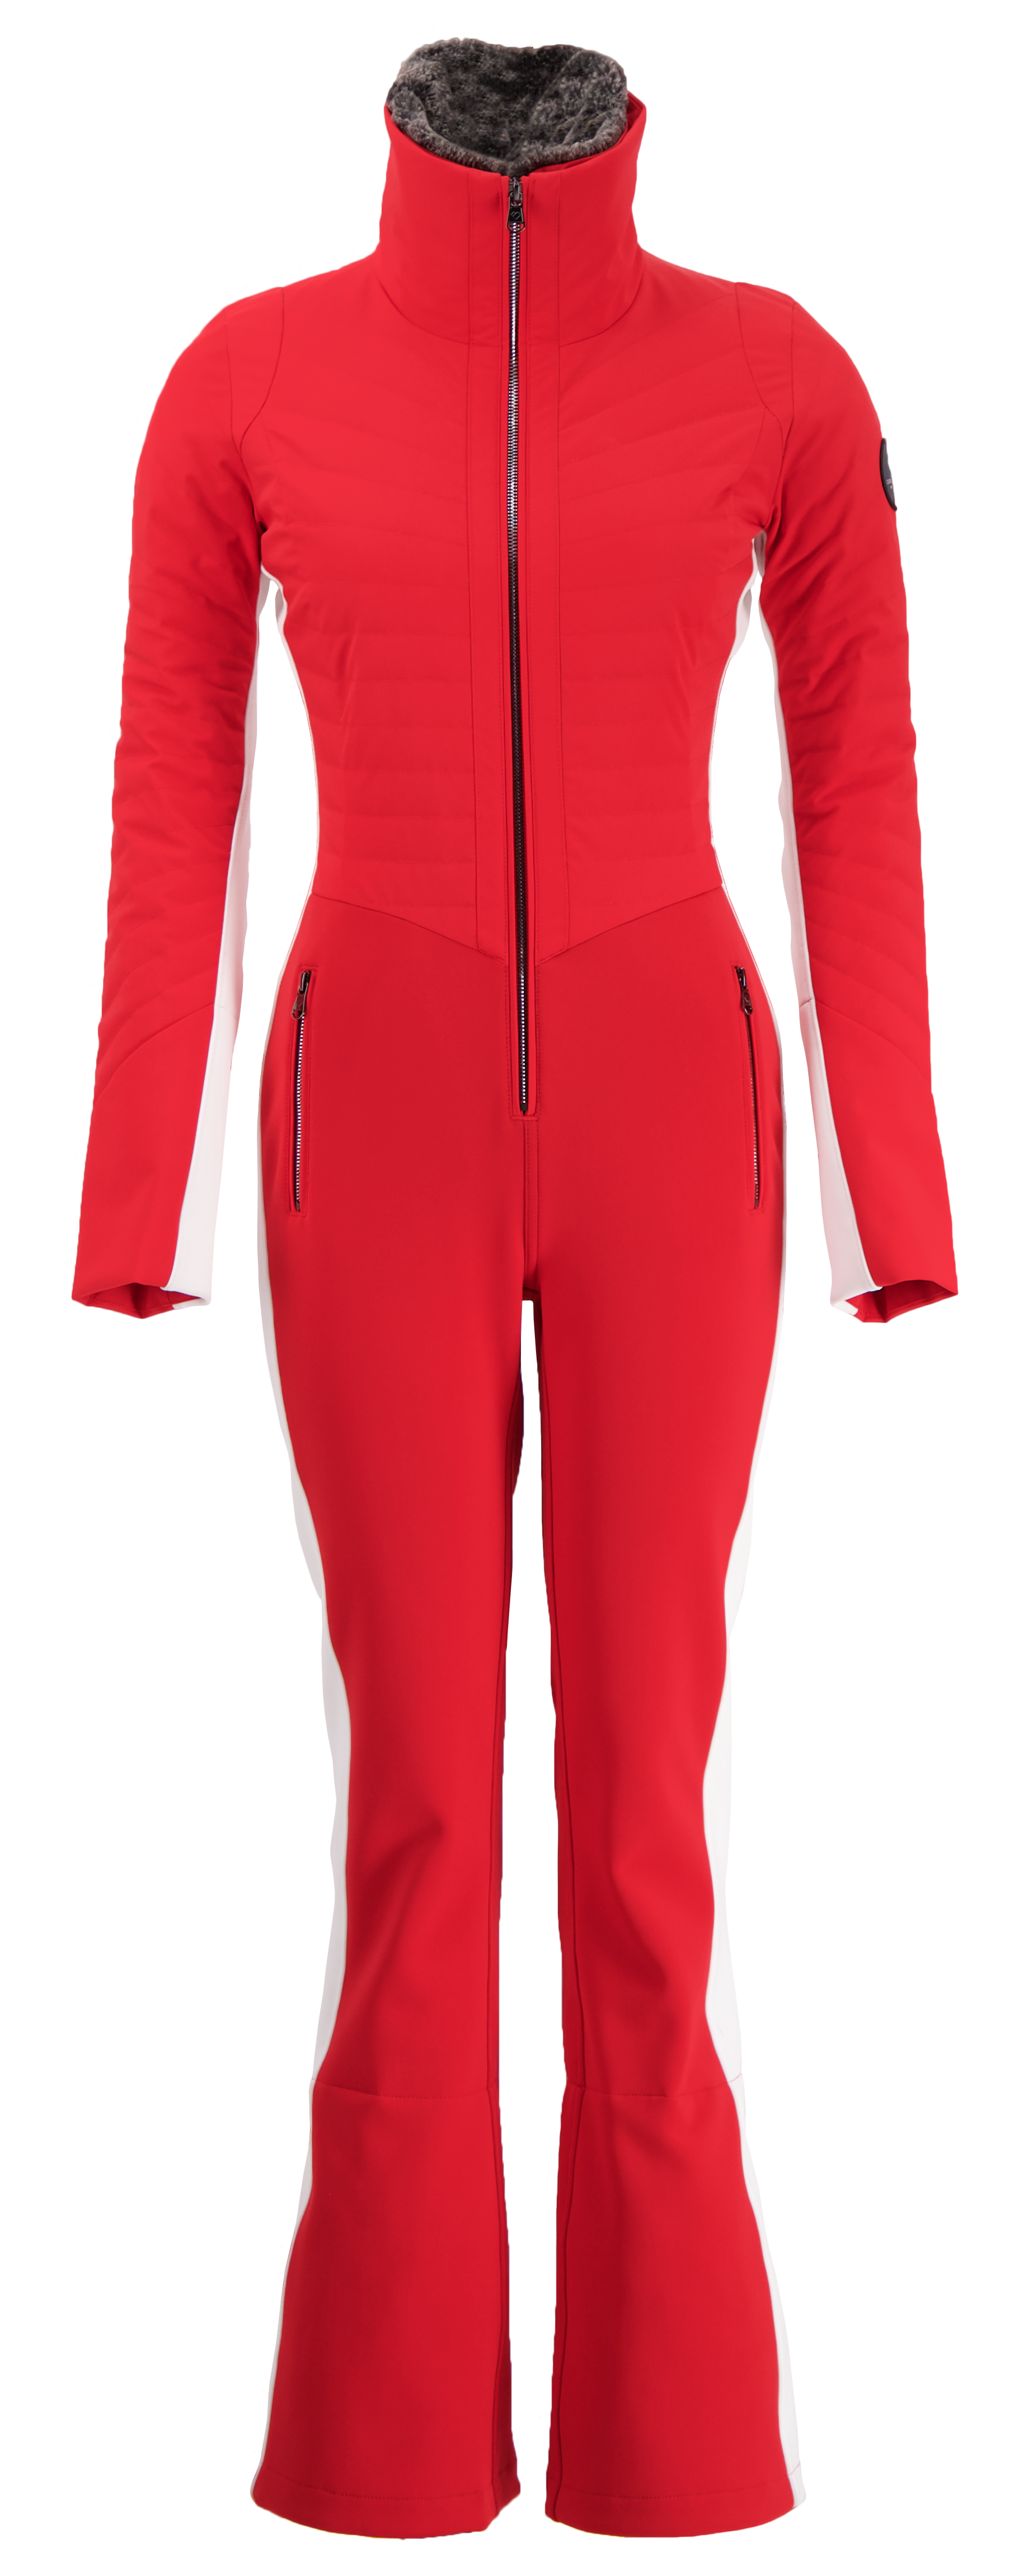 2016 Nordica Belle Pro 105